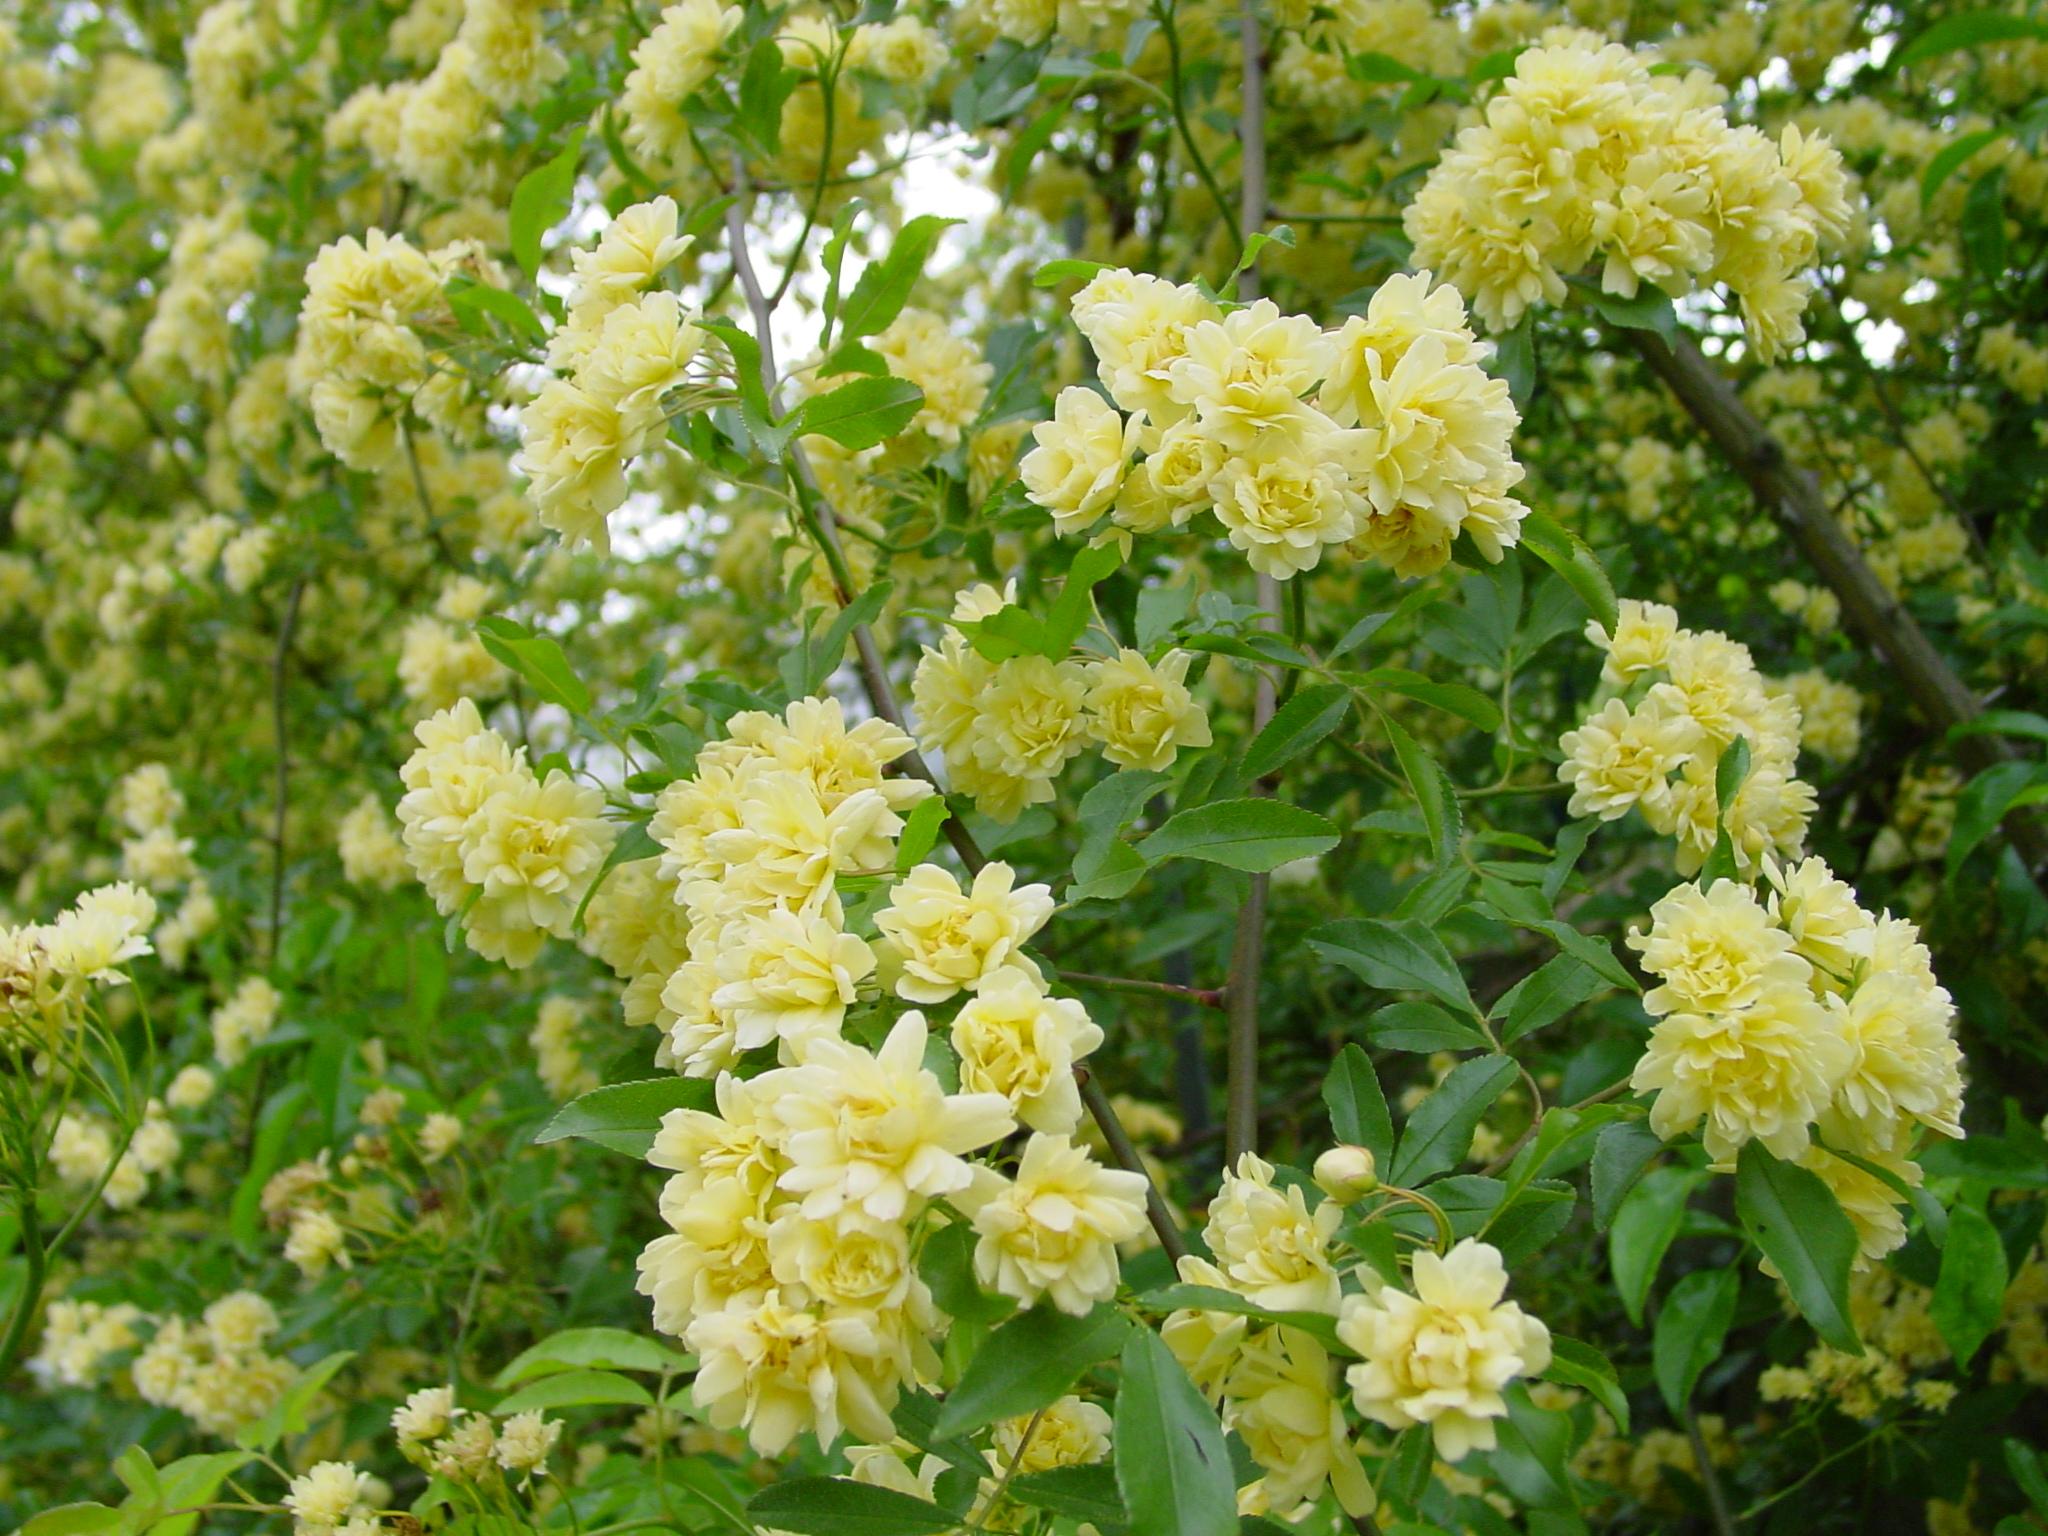 Arbusto A Fiori Gialli rosa banksiae lutea - il giardino azienda floricola